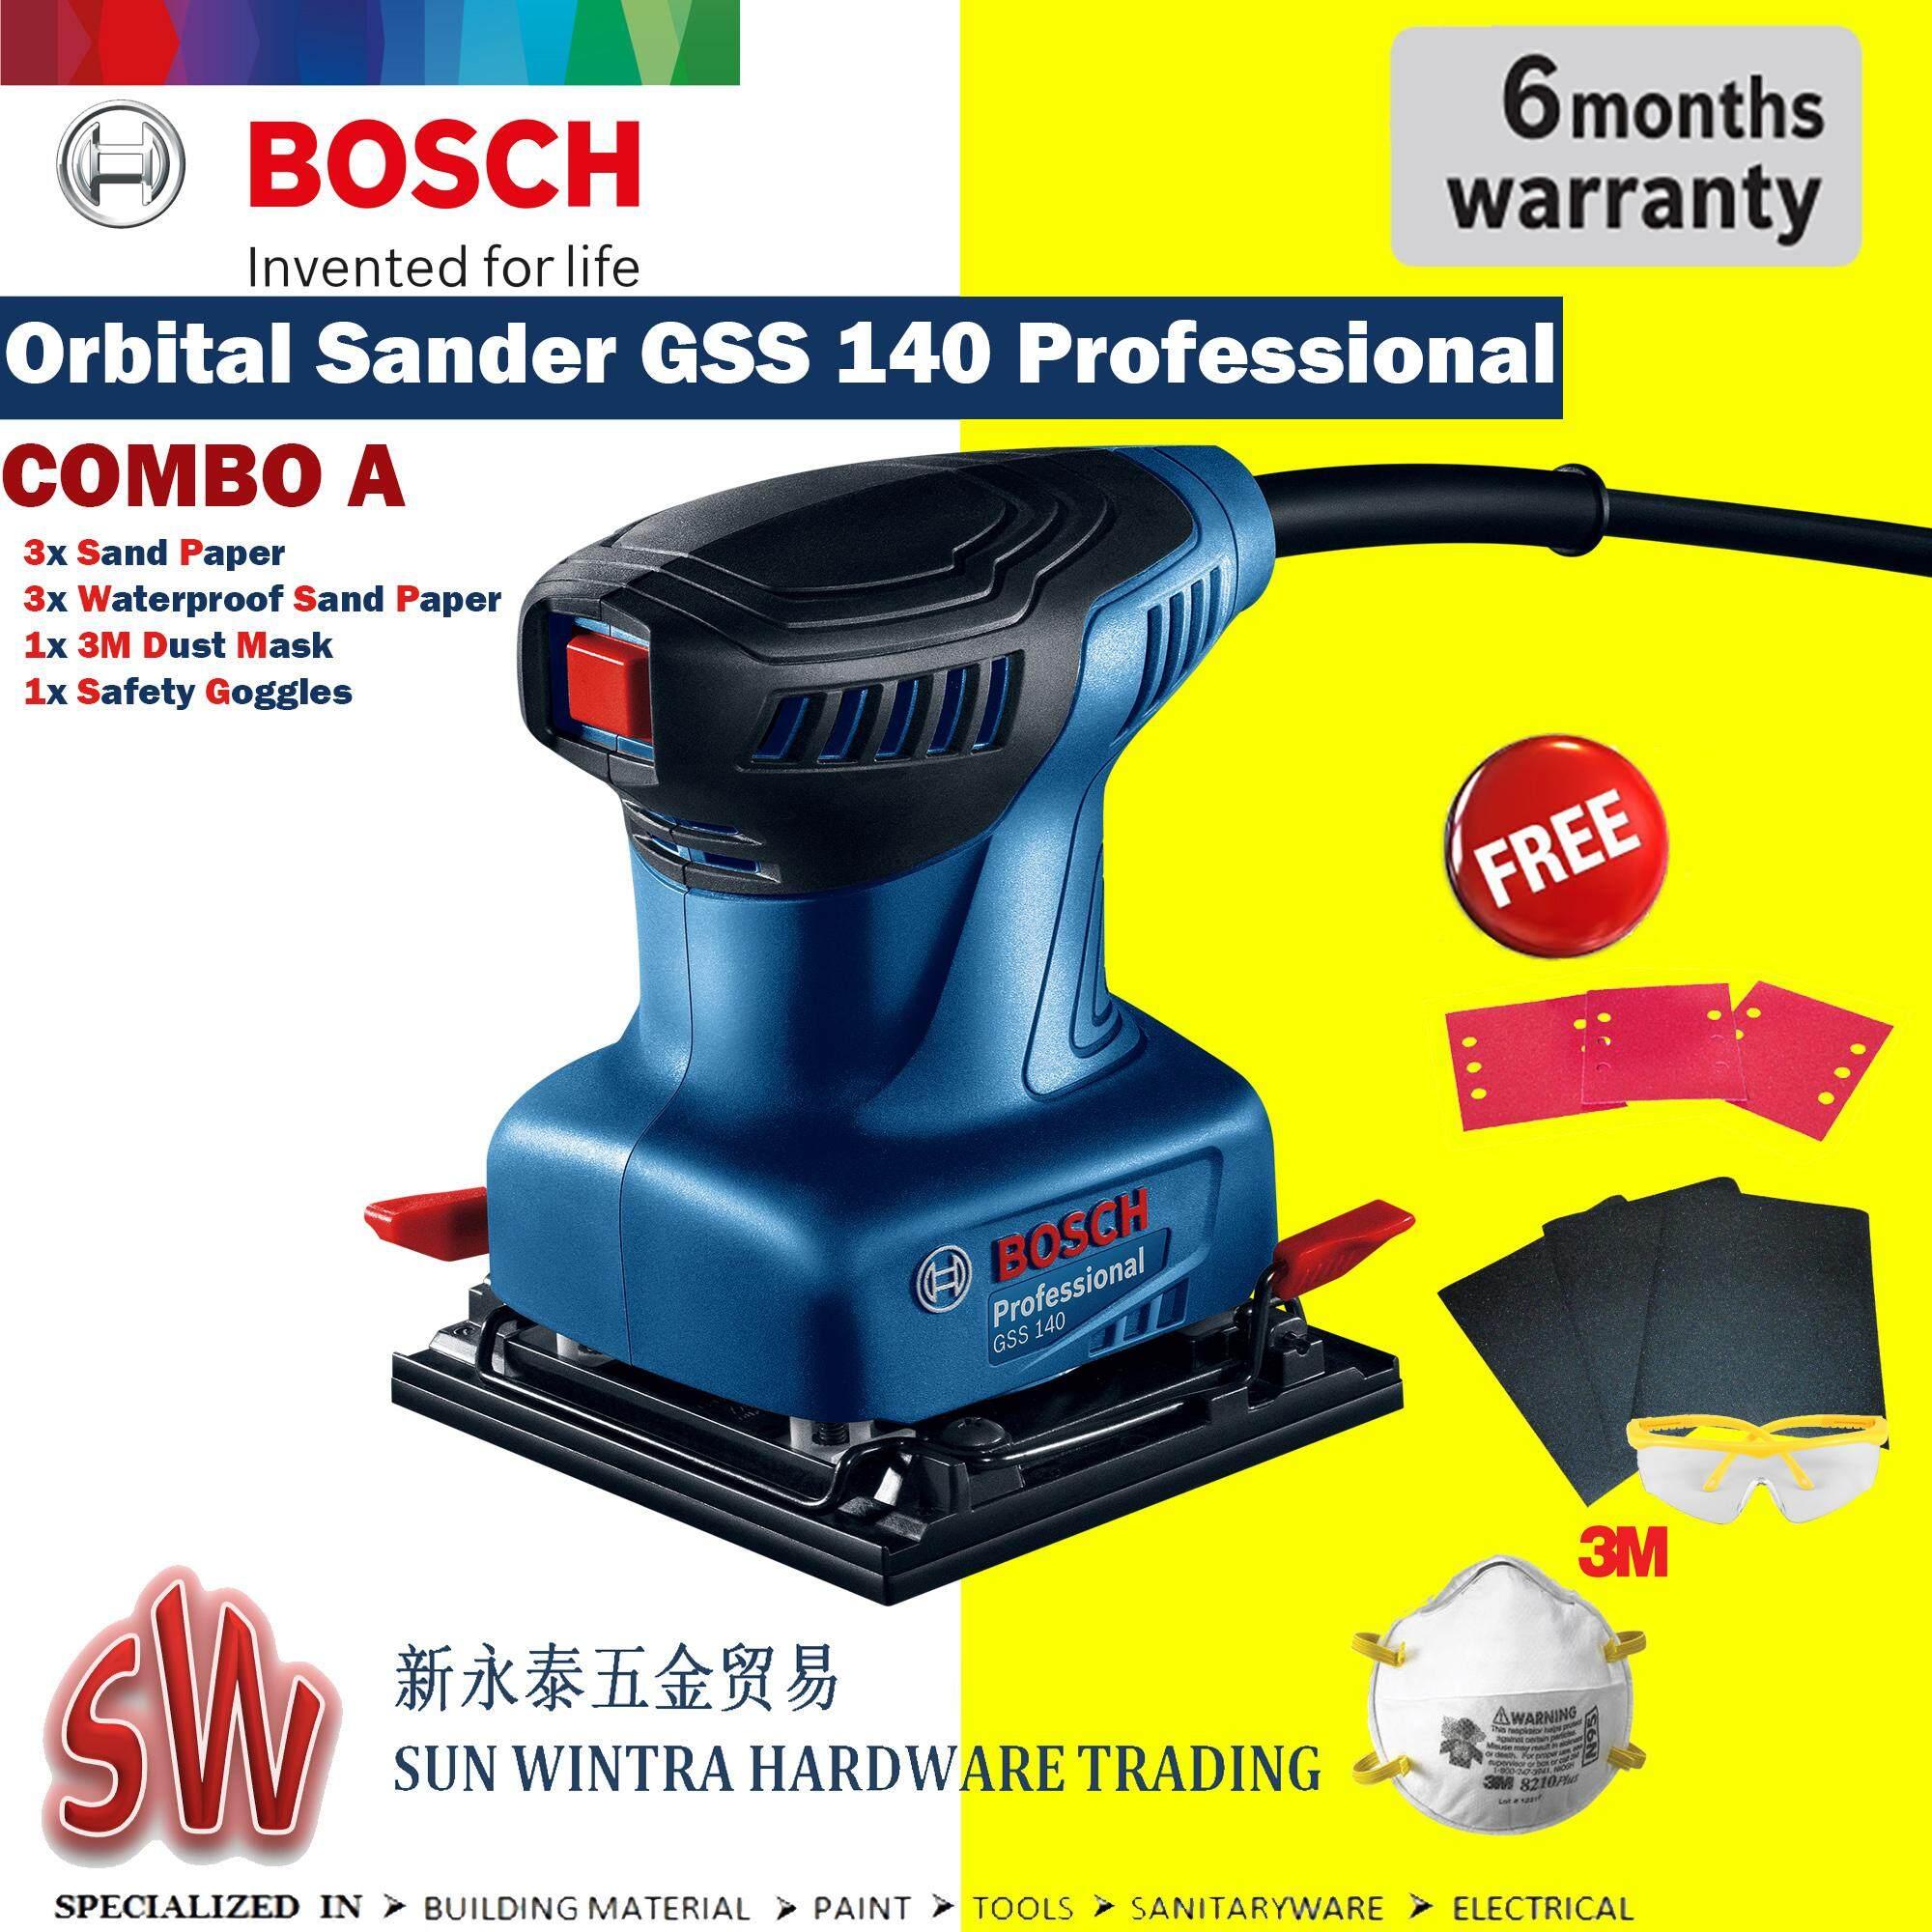 BOSCH GSS140 Orbital Sander F.O.C 3M Product,Sand Paper